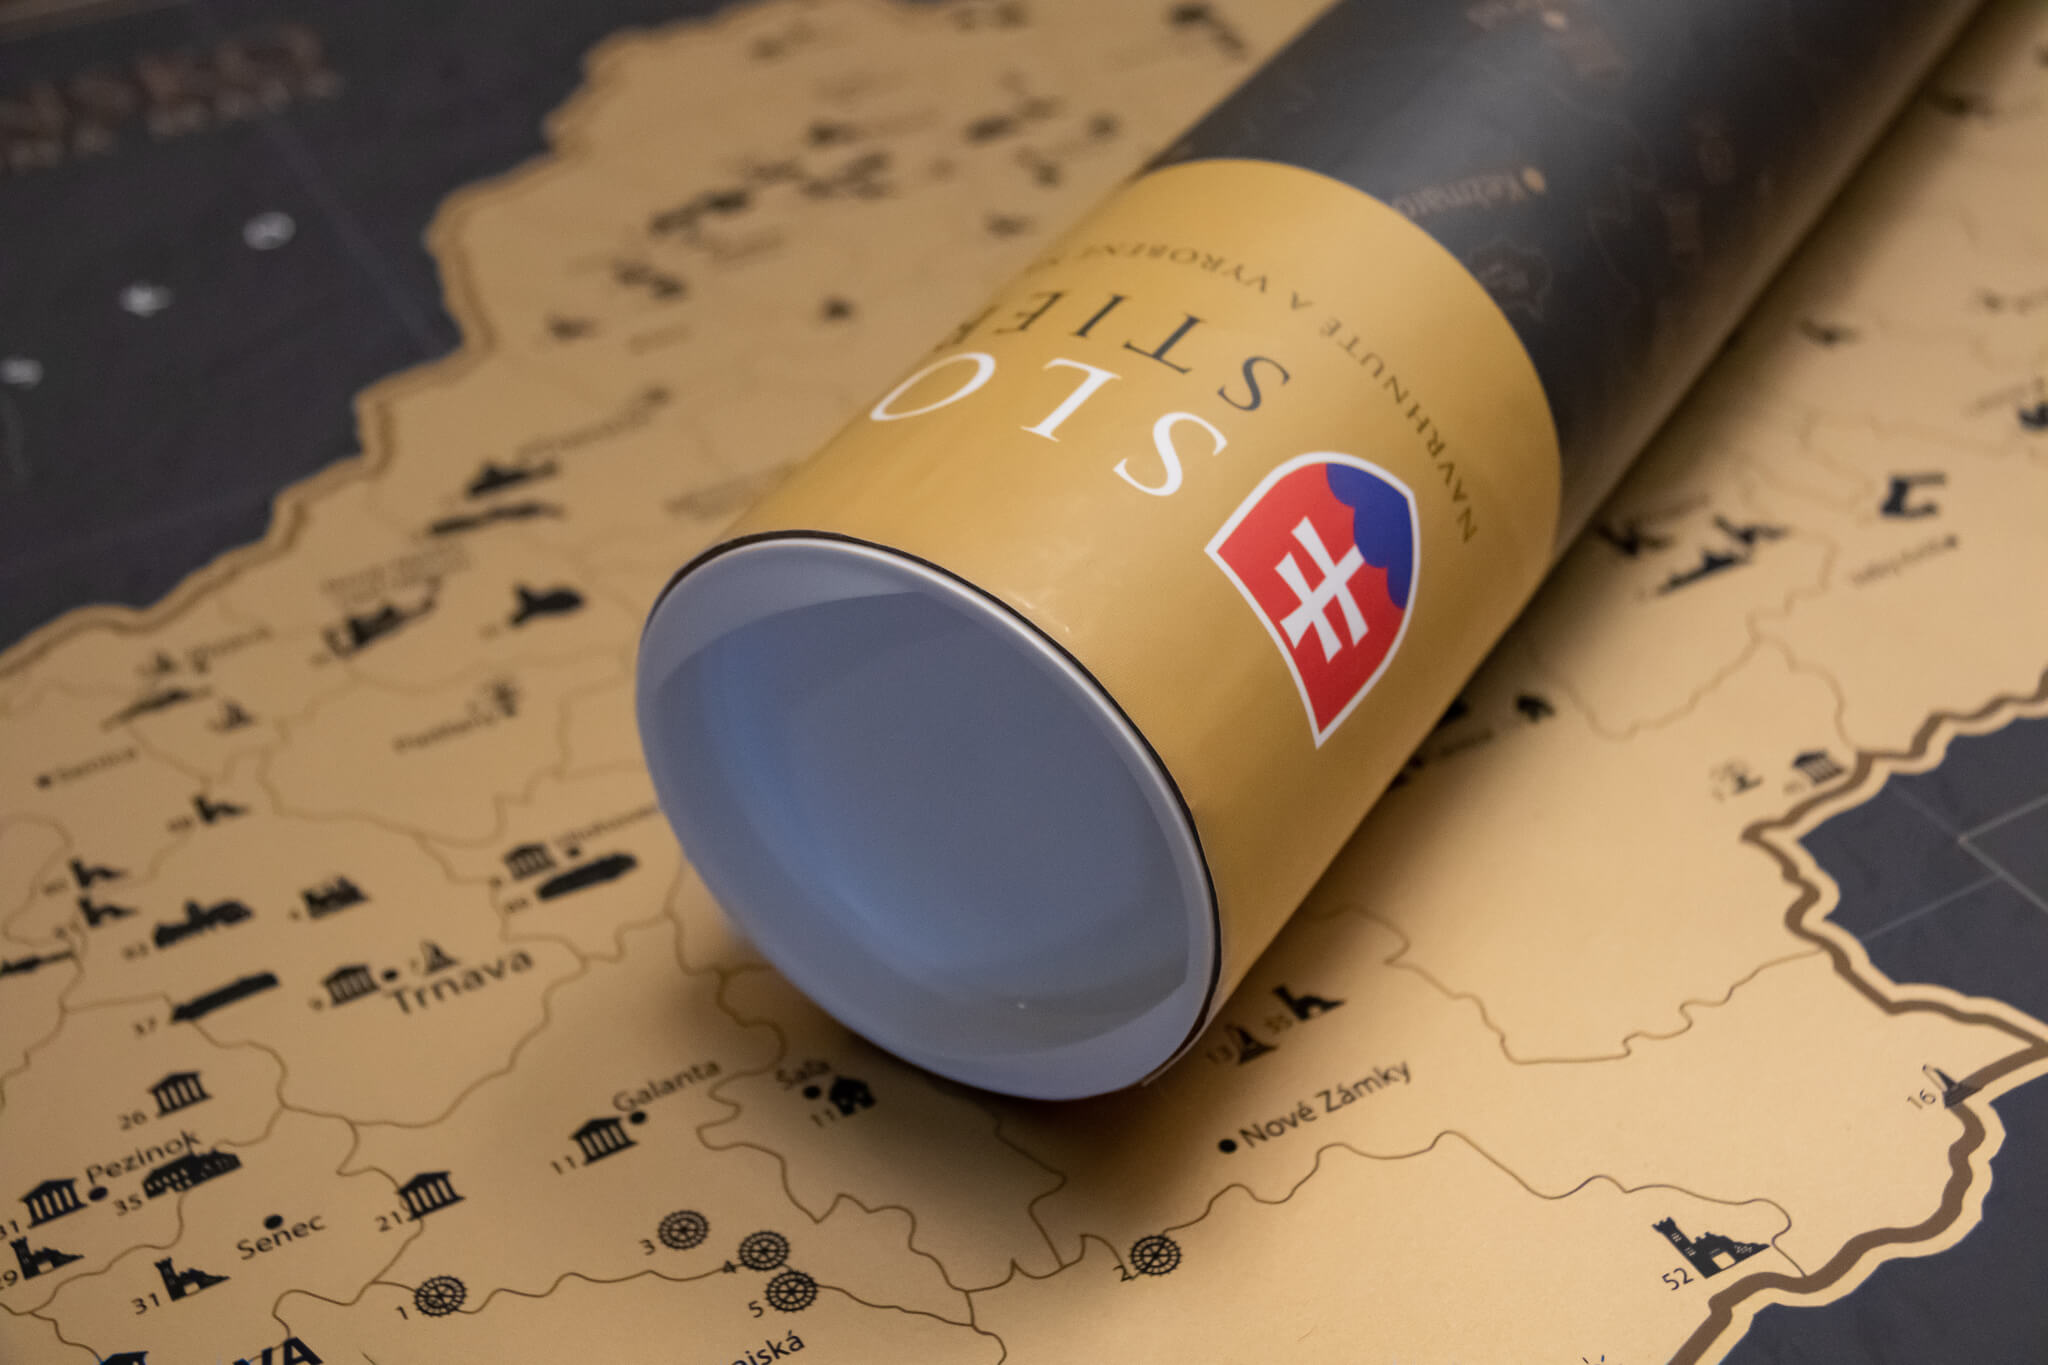 Mapa para raspar de Eslovaquia - Detalle del tubo de regalo